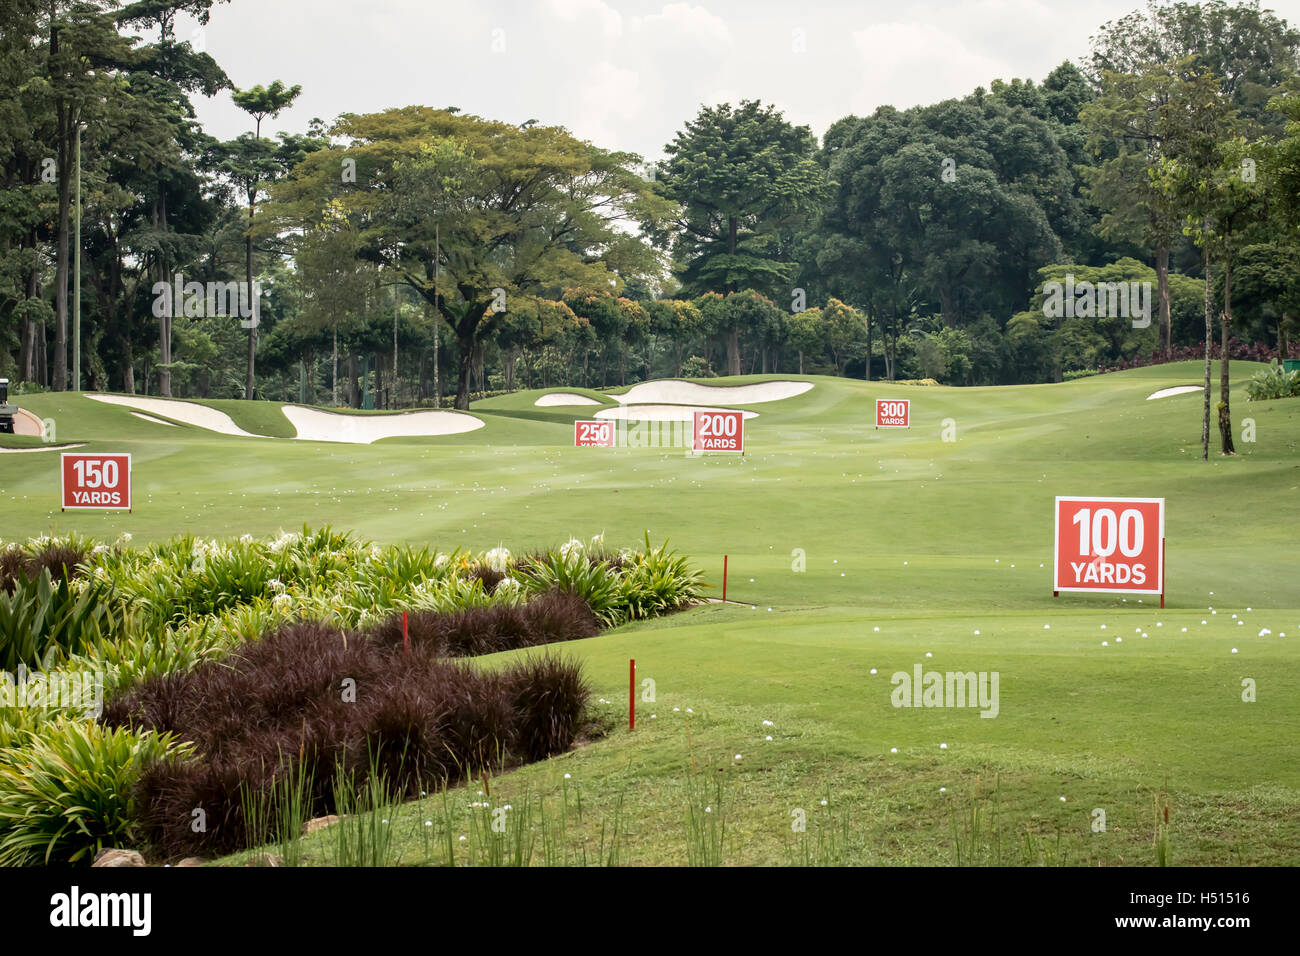 Kuala Lumpur, Malaysia.  19th Oct, 2016. A view of the driving range set up for CIMB PGA Championship starts on - Stock Image